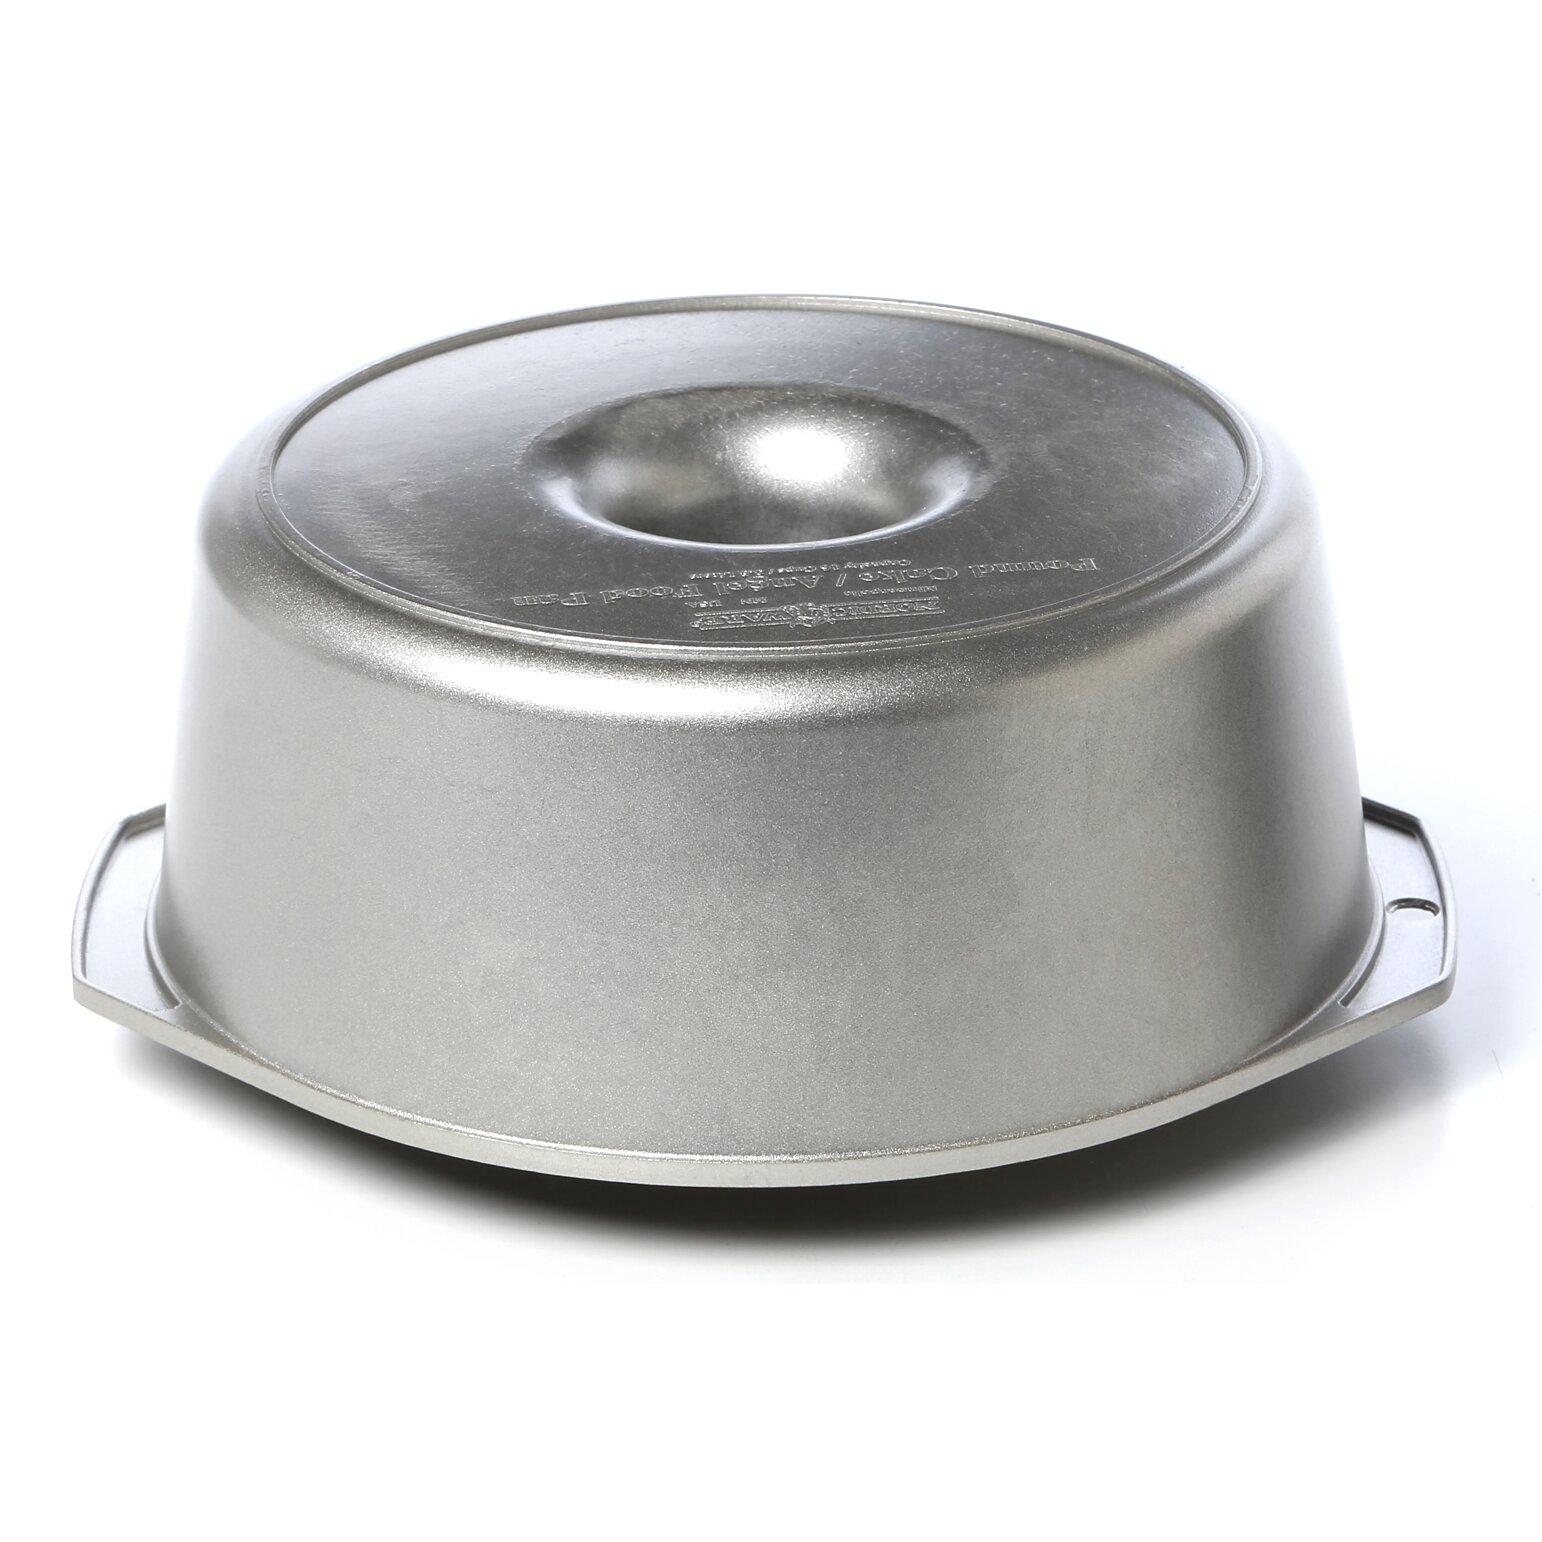 Square Pound Cake Pan